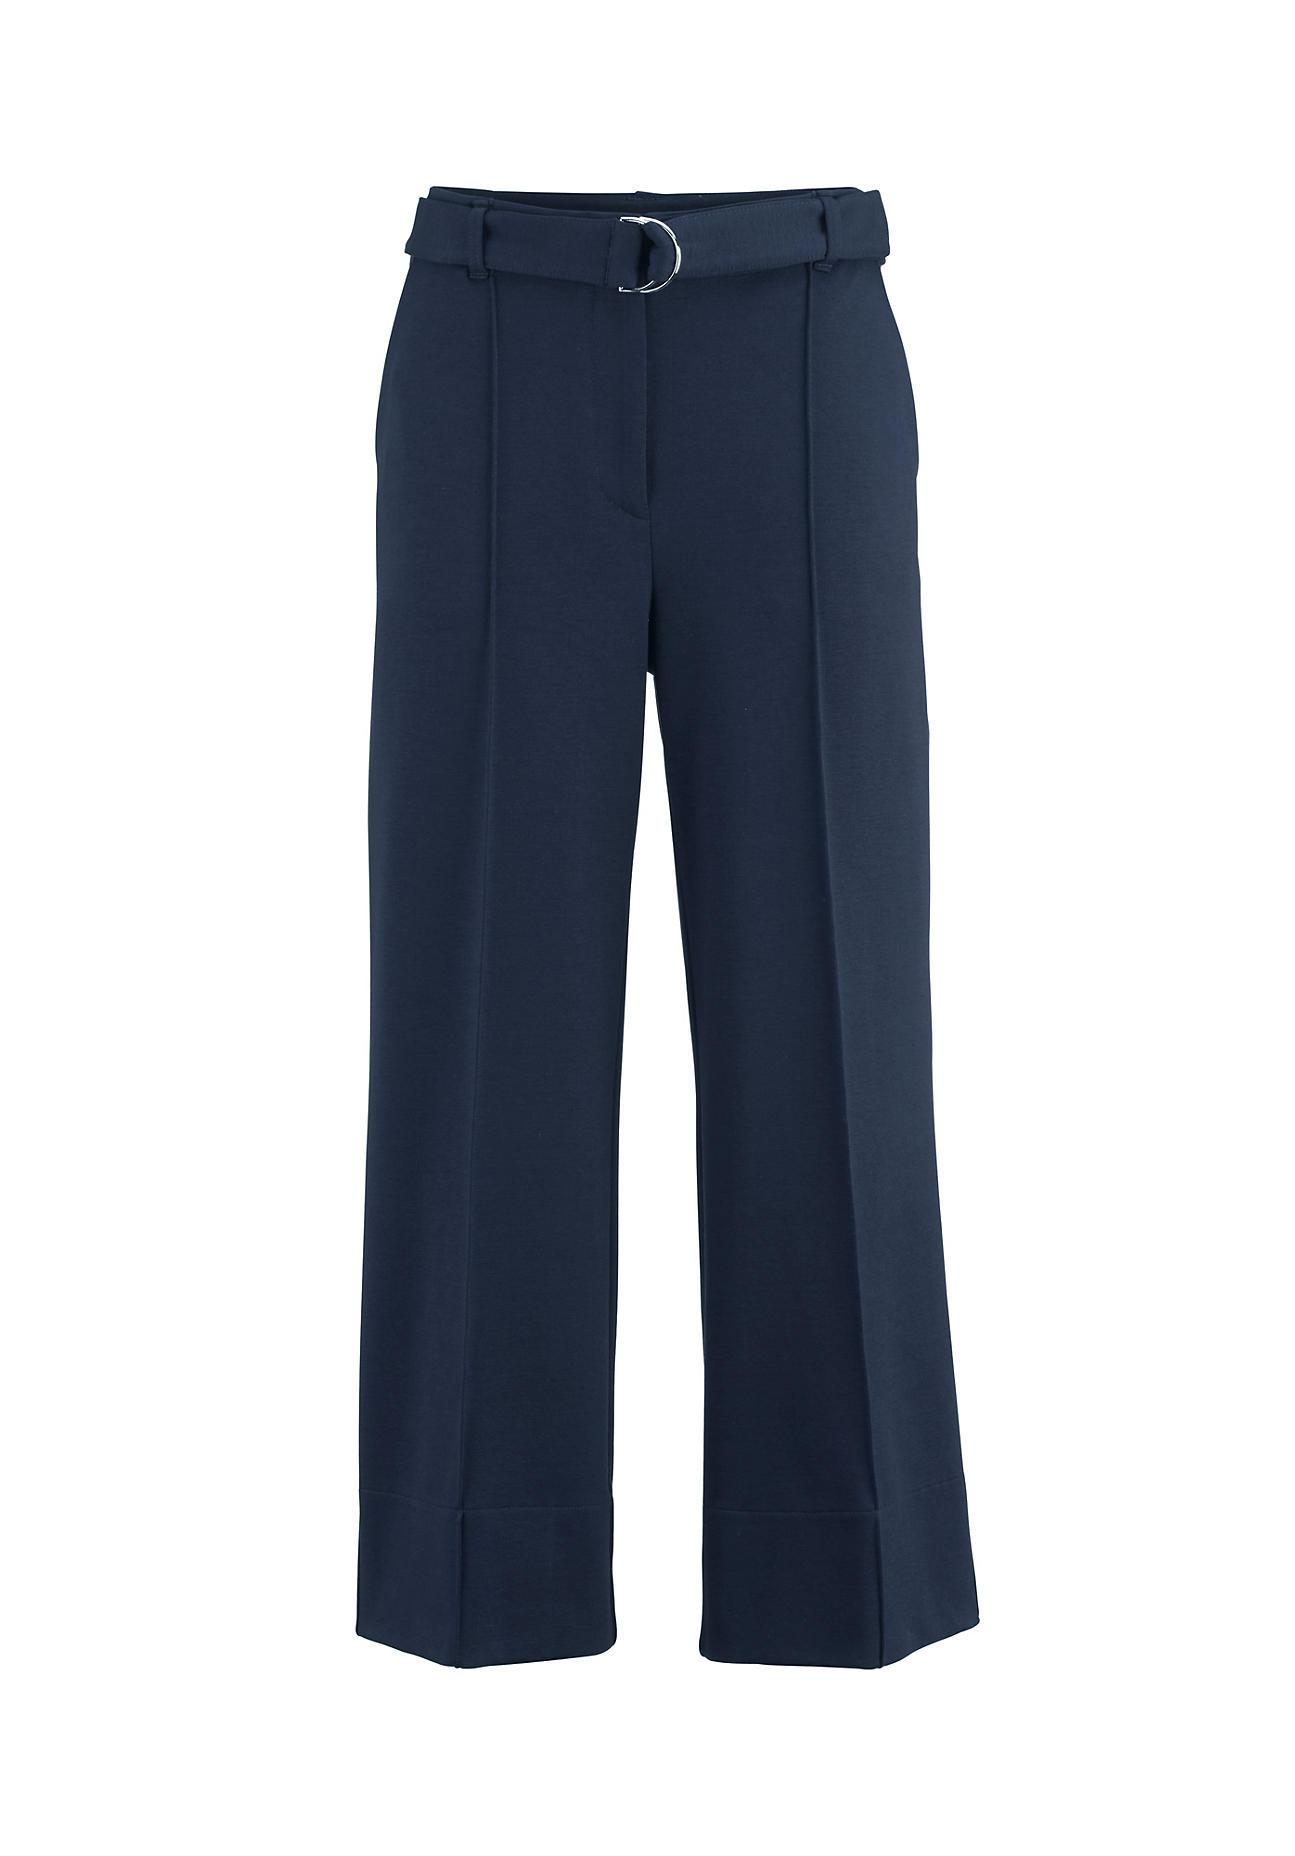 Hosen - hessnatur Damen Jersey Culotte aus Bio Baumwolle mit TENCEL™Modal – blau –  - Onlineshop Hessnatur